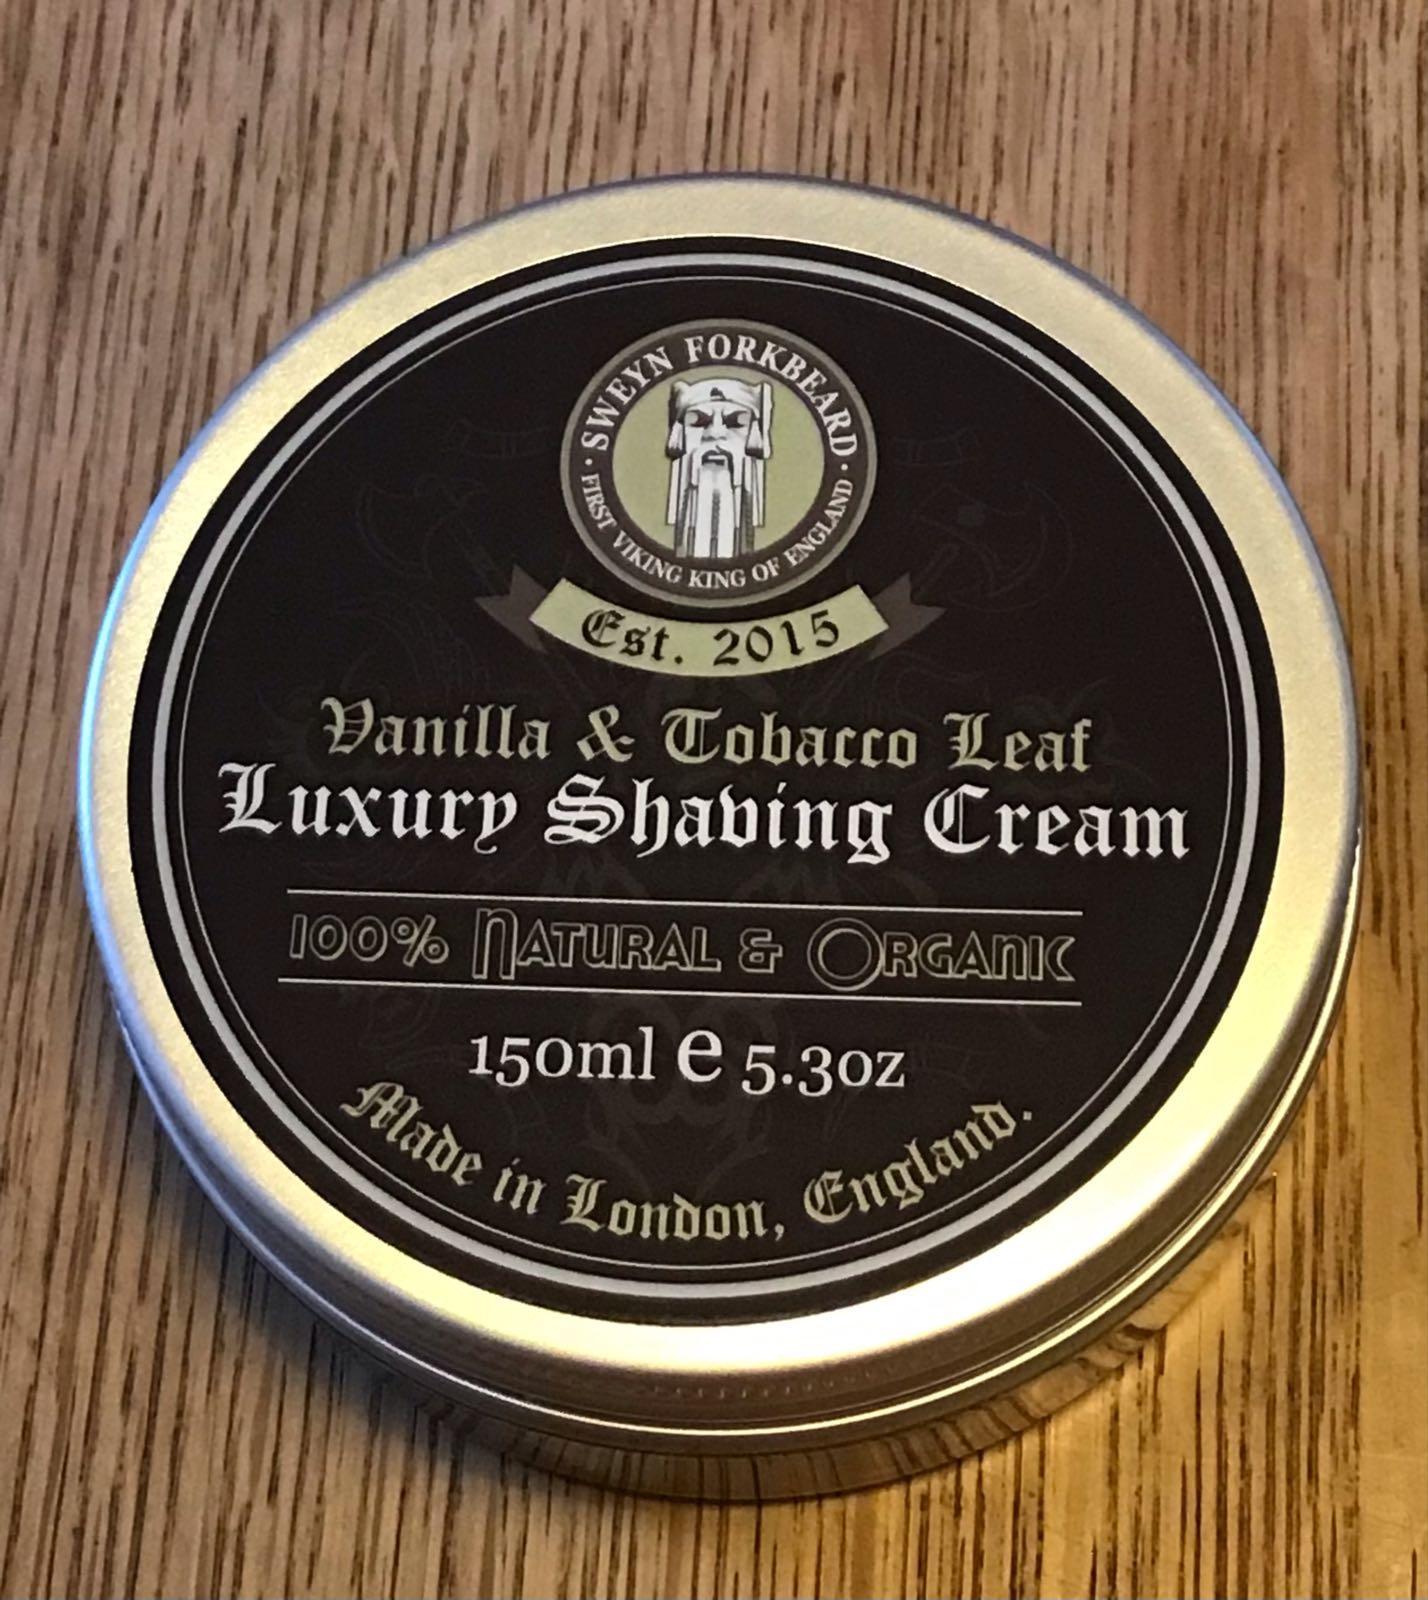 SF Vanilla & Tobacco Leaf  Shaving Cream